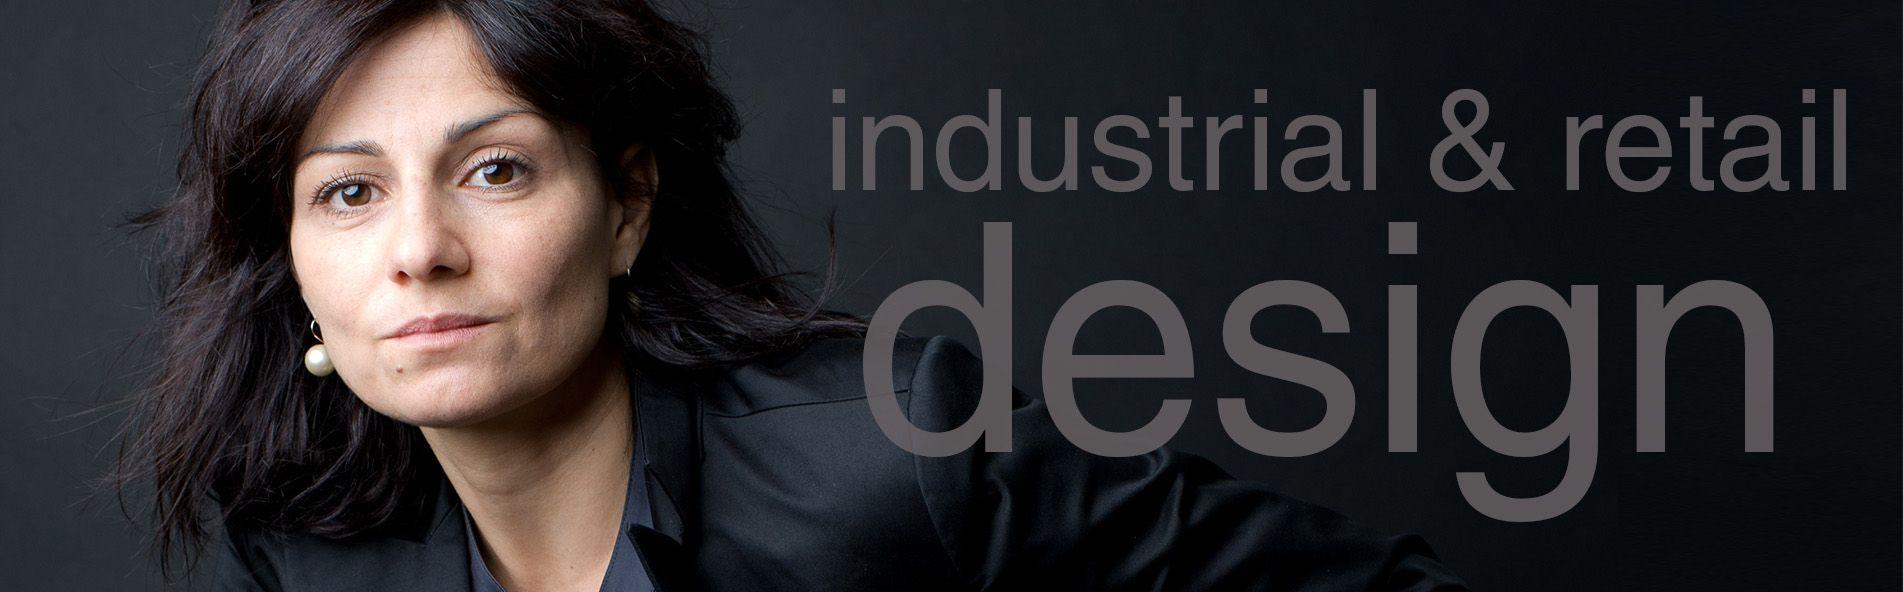 Nayla Pallard Design, Agence design produit industriel espace retail commercial